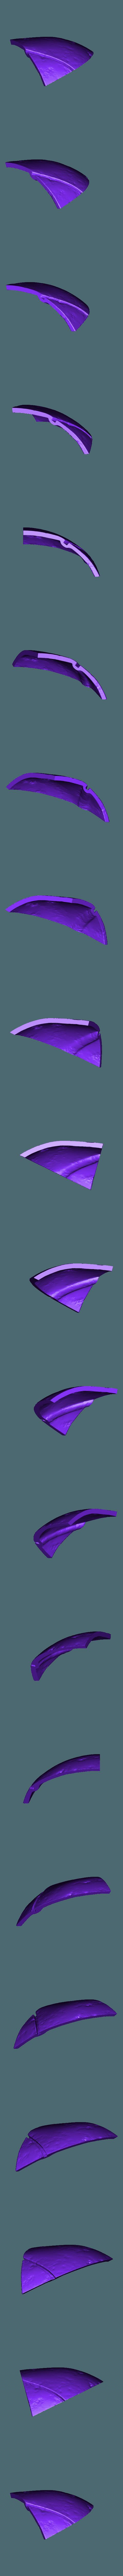 Armory_Damaged_Print32.stl Download OBJ file Armory - Knights of Ren Helmet (damaged), 3D print model • 3D print design, 3D-mon